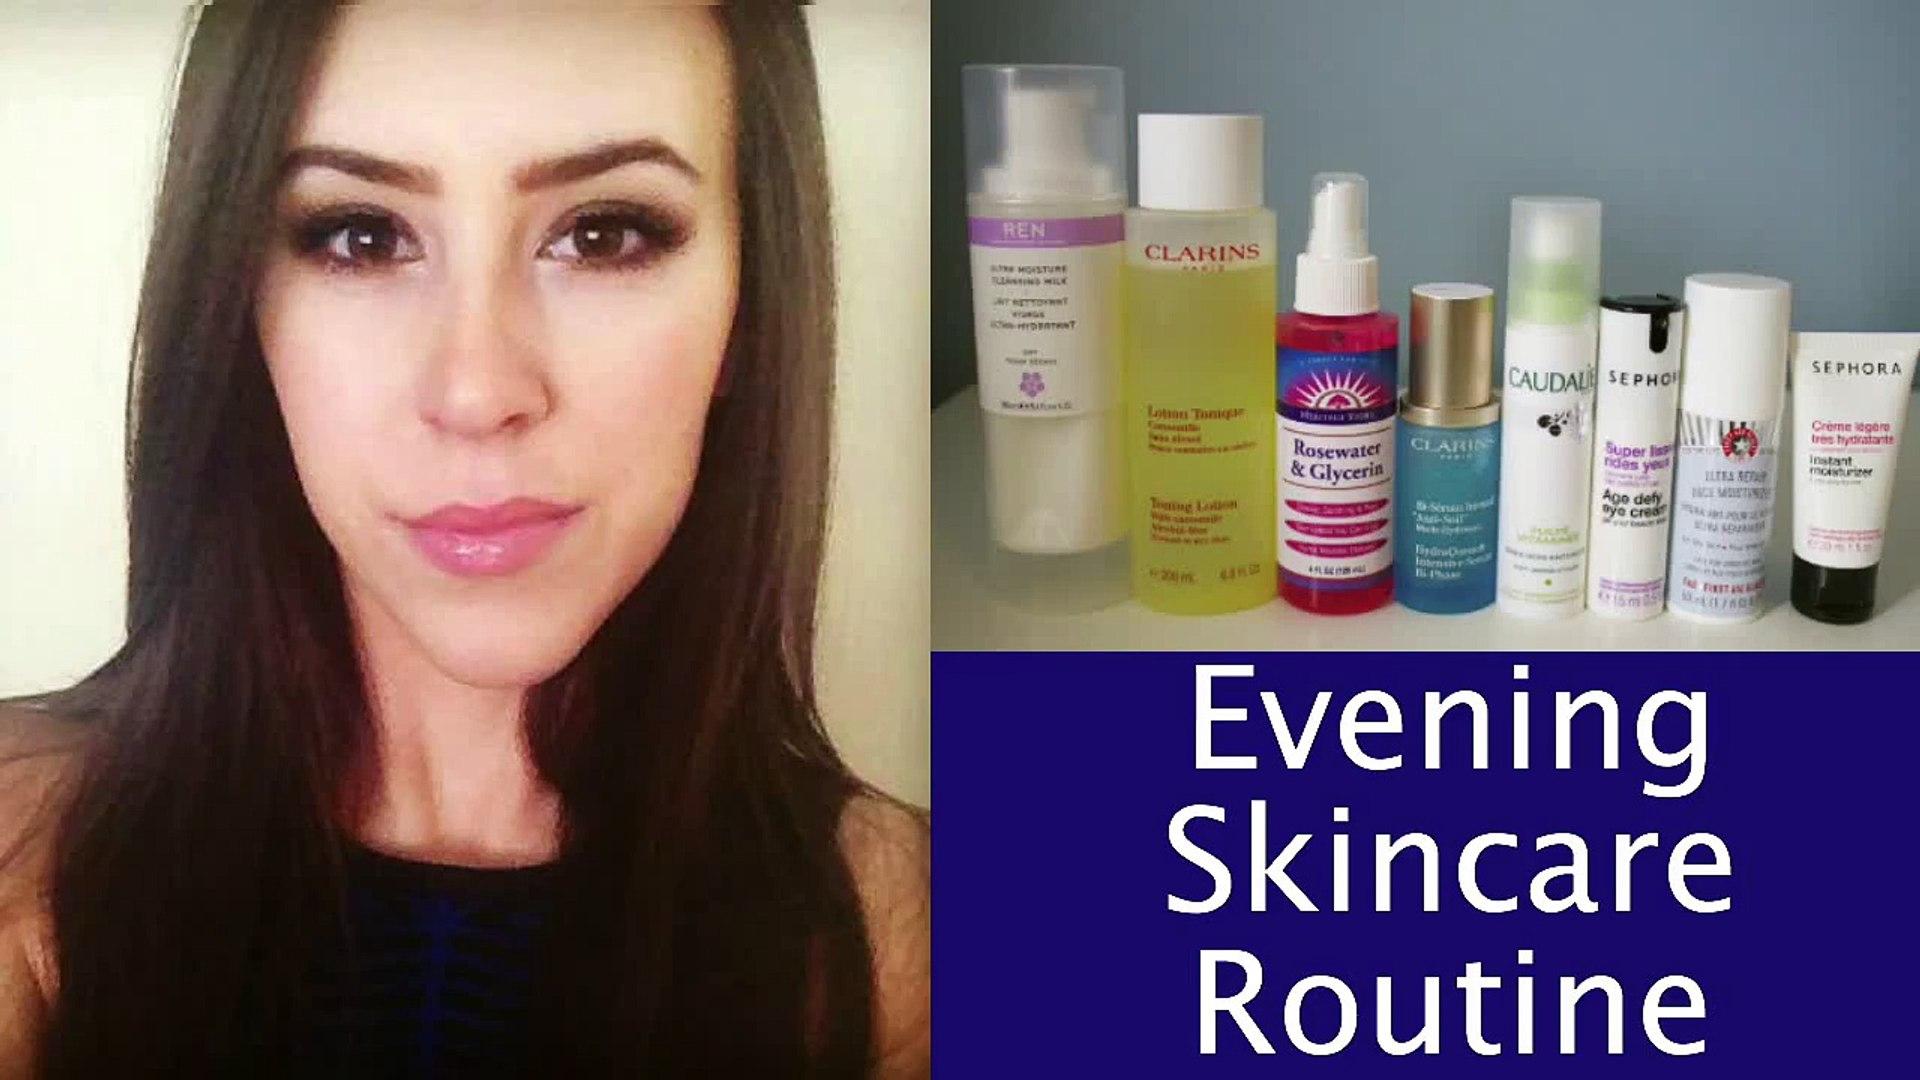 Skincare Routine (Evening): Very Dry Sensitive Skin 2014